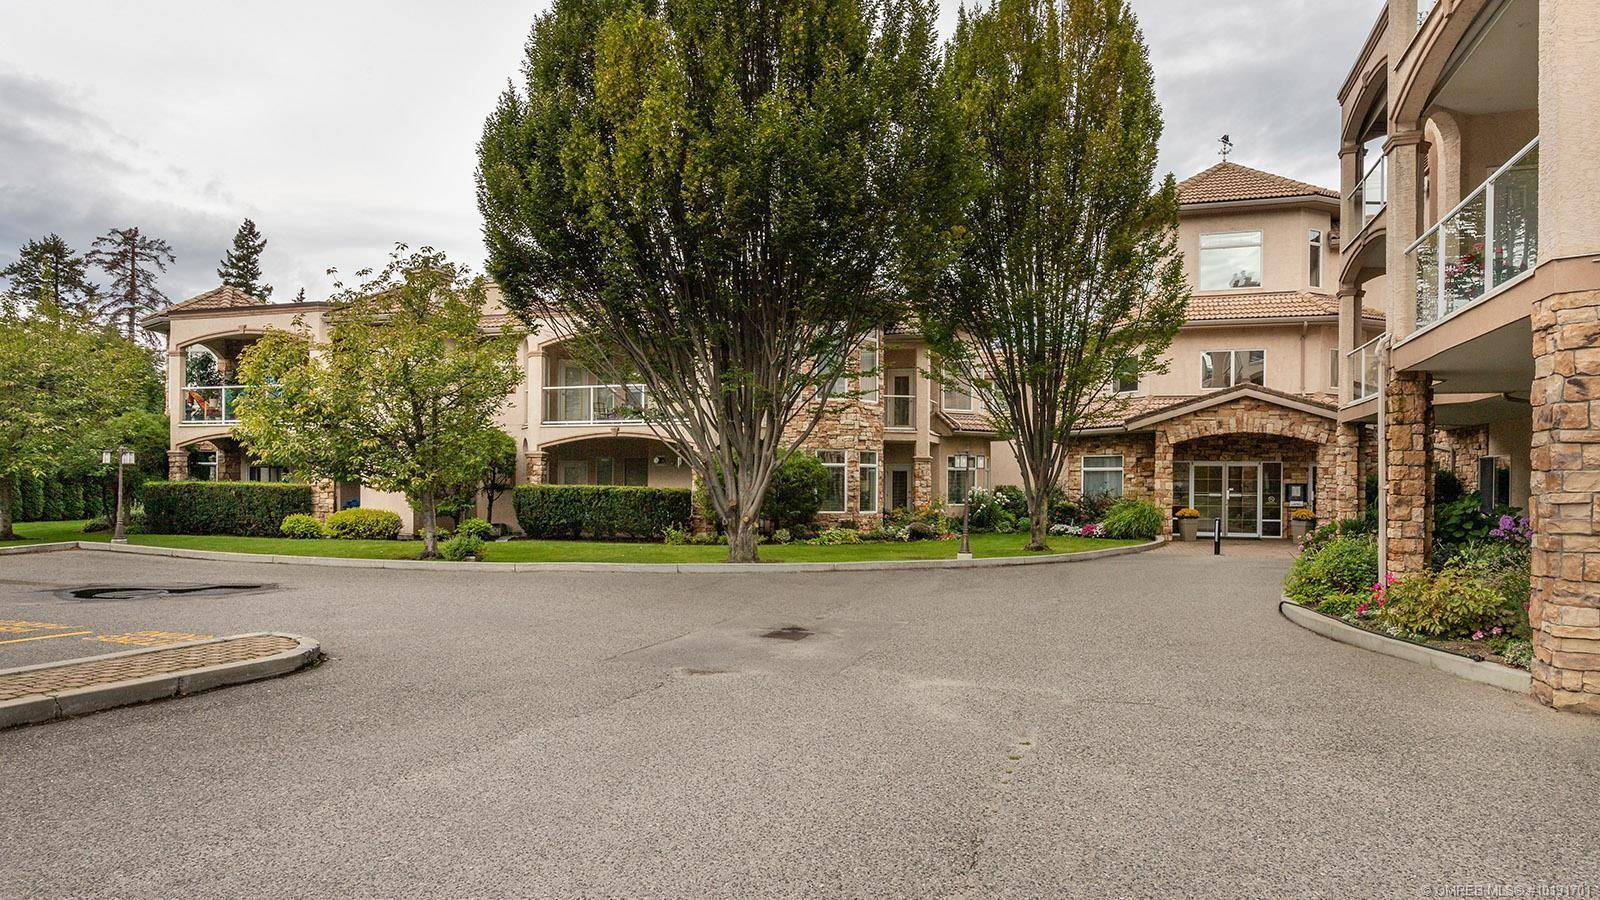 Condo for sale at 634 Lequime Rd Unit 103 Kelowna British Columbia - MLS: 10191701